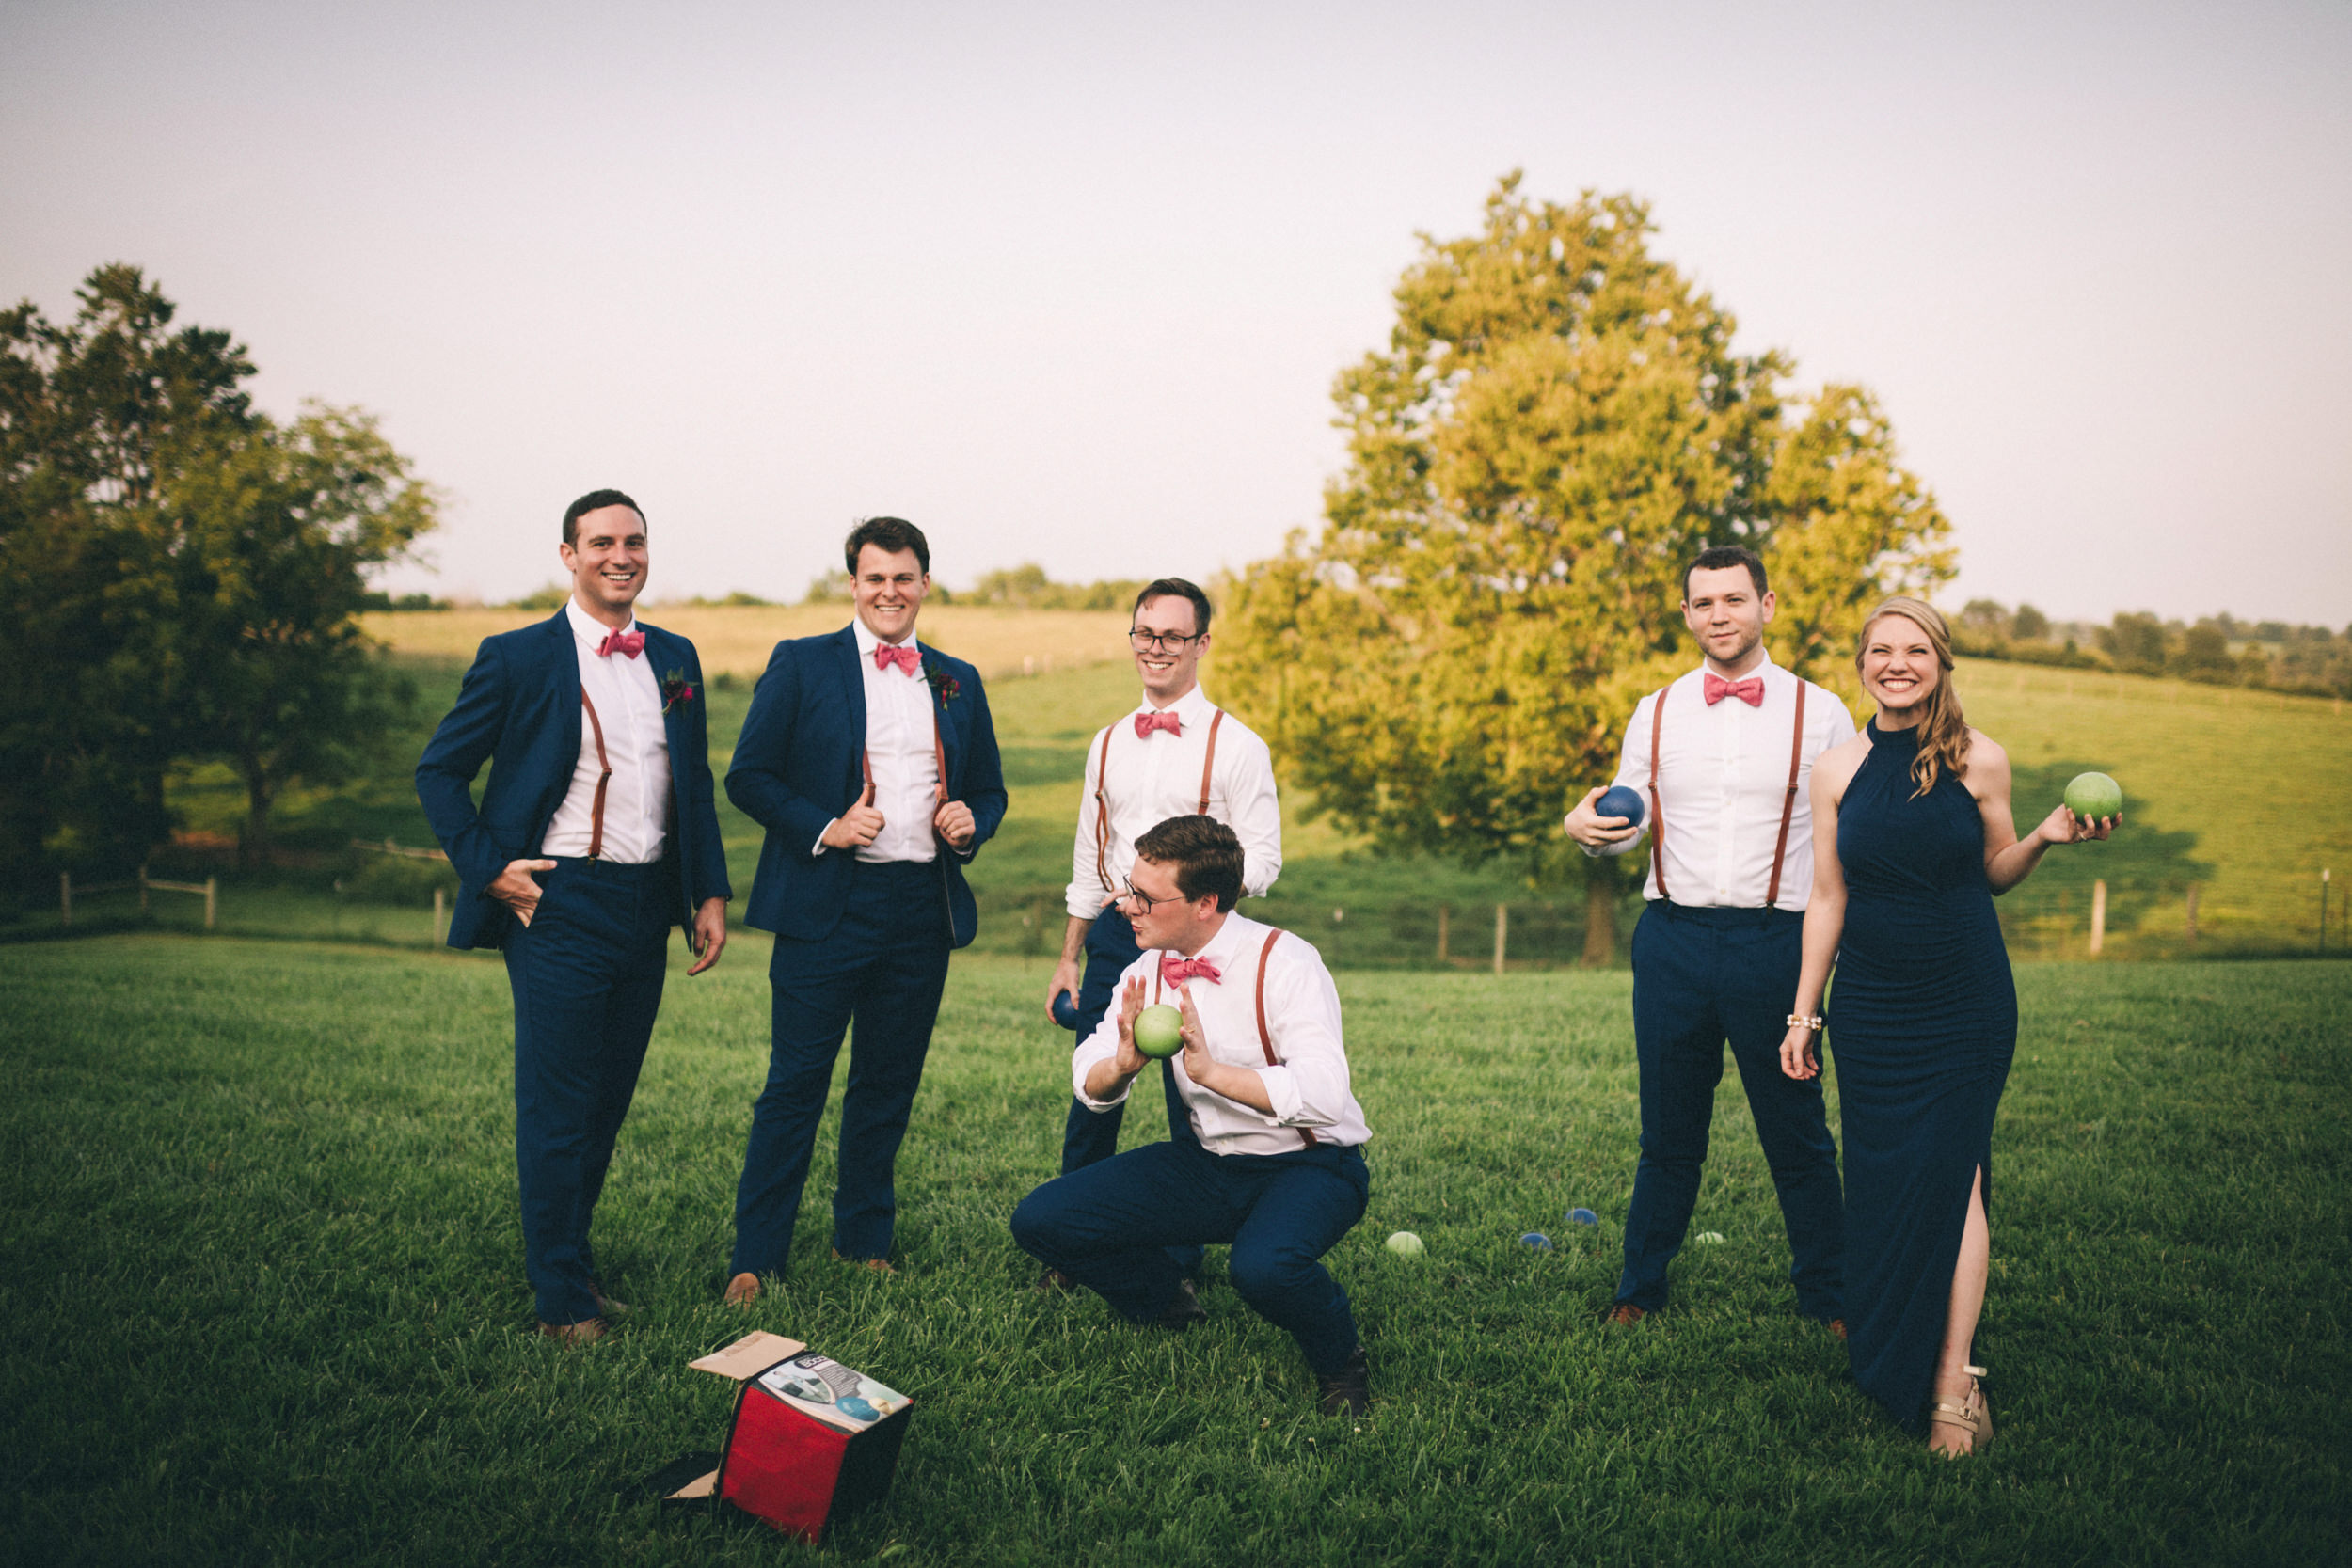 Louisville-Kentucky-Wedding-and-Elopement-Photographer-Sarah-Katherine-Davis-Photography-Summer-Jewel-Toned-Wedding-Chineese-Tea-Ceremony-Warrenwood-Manor-Danville-749.jpg